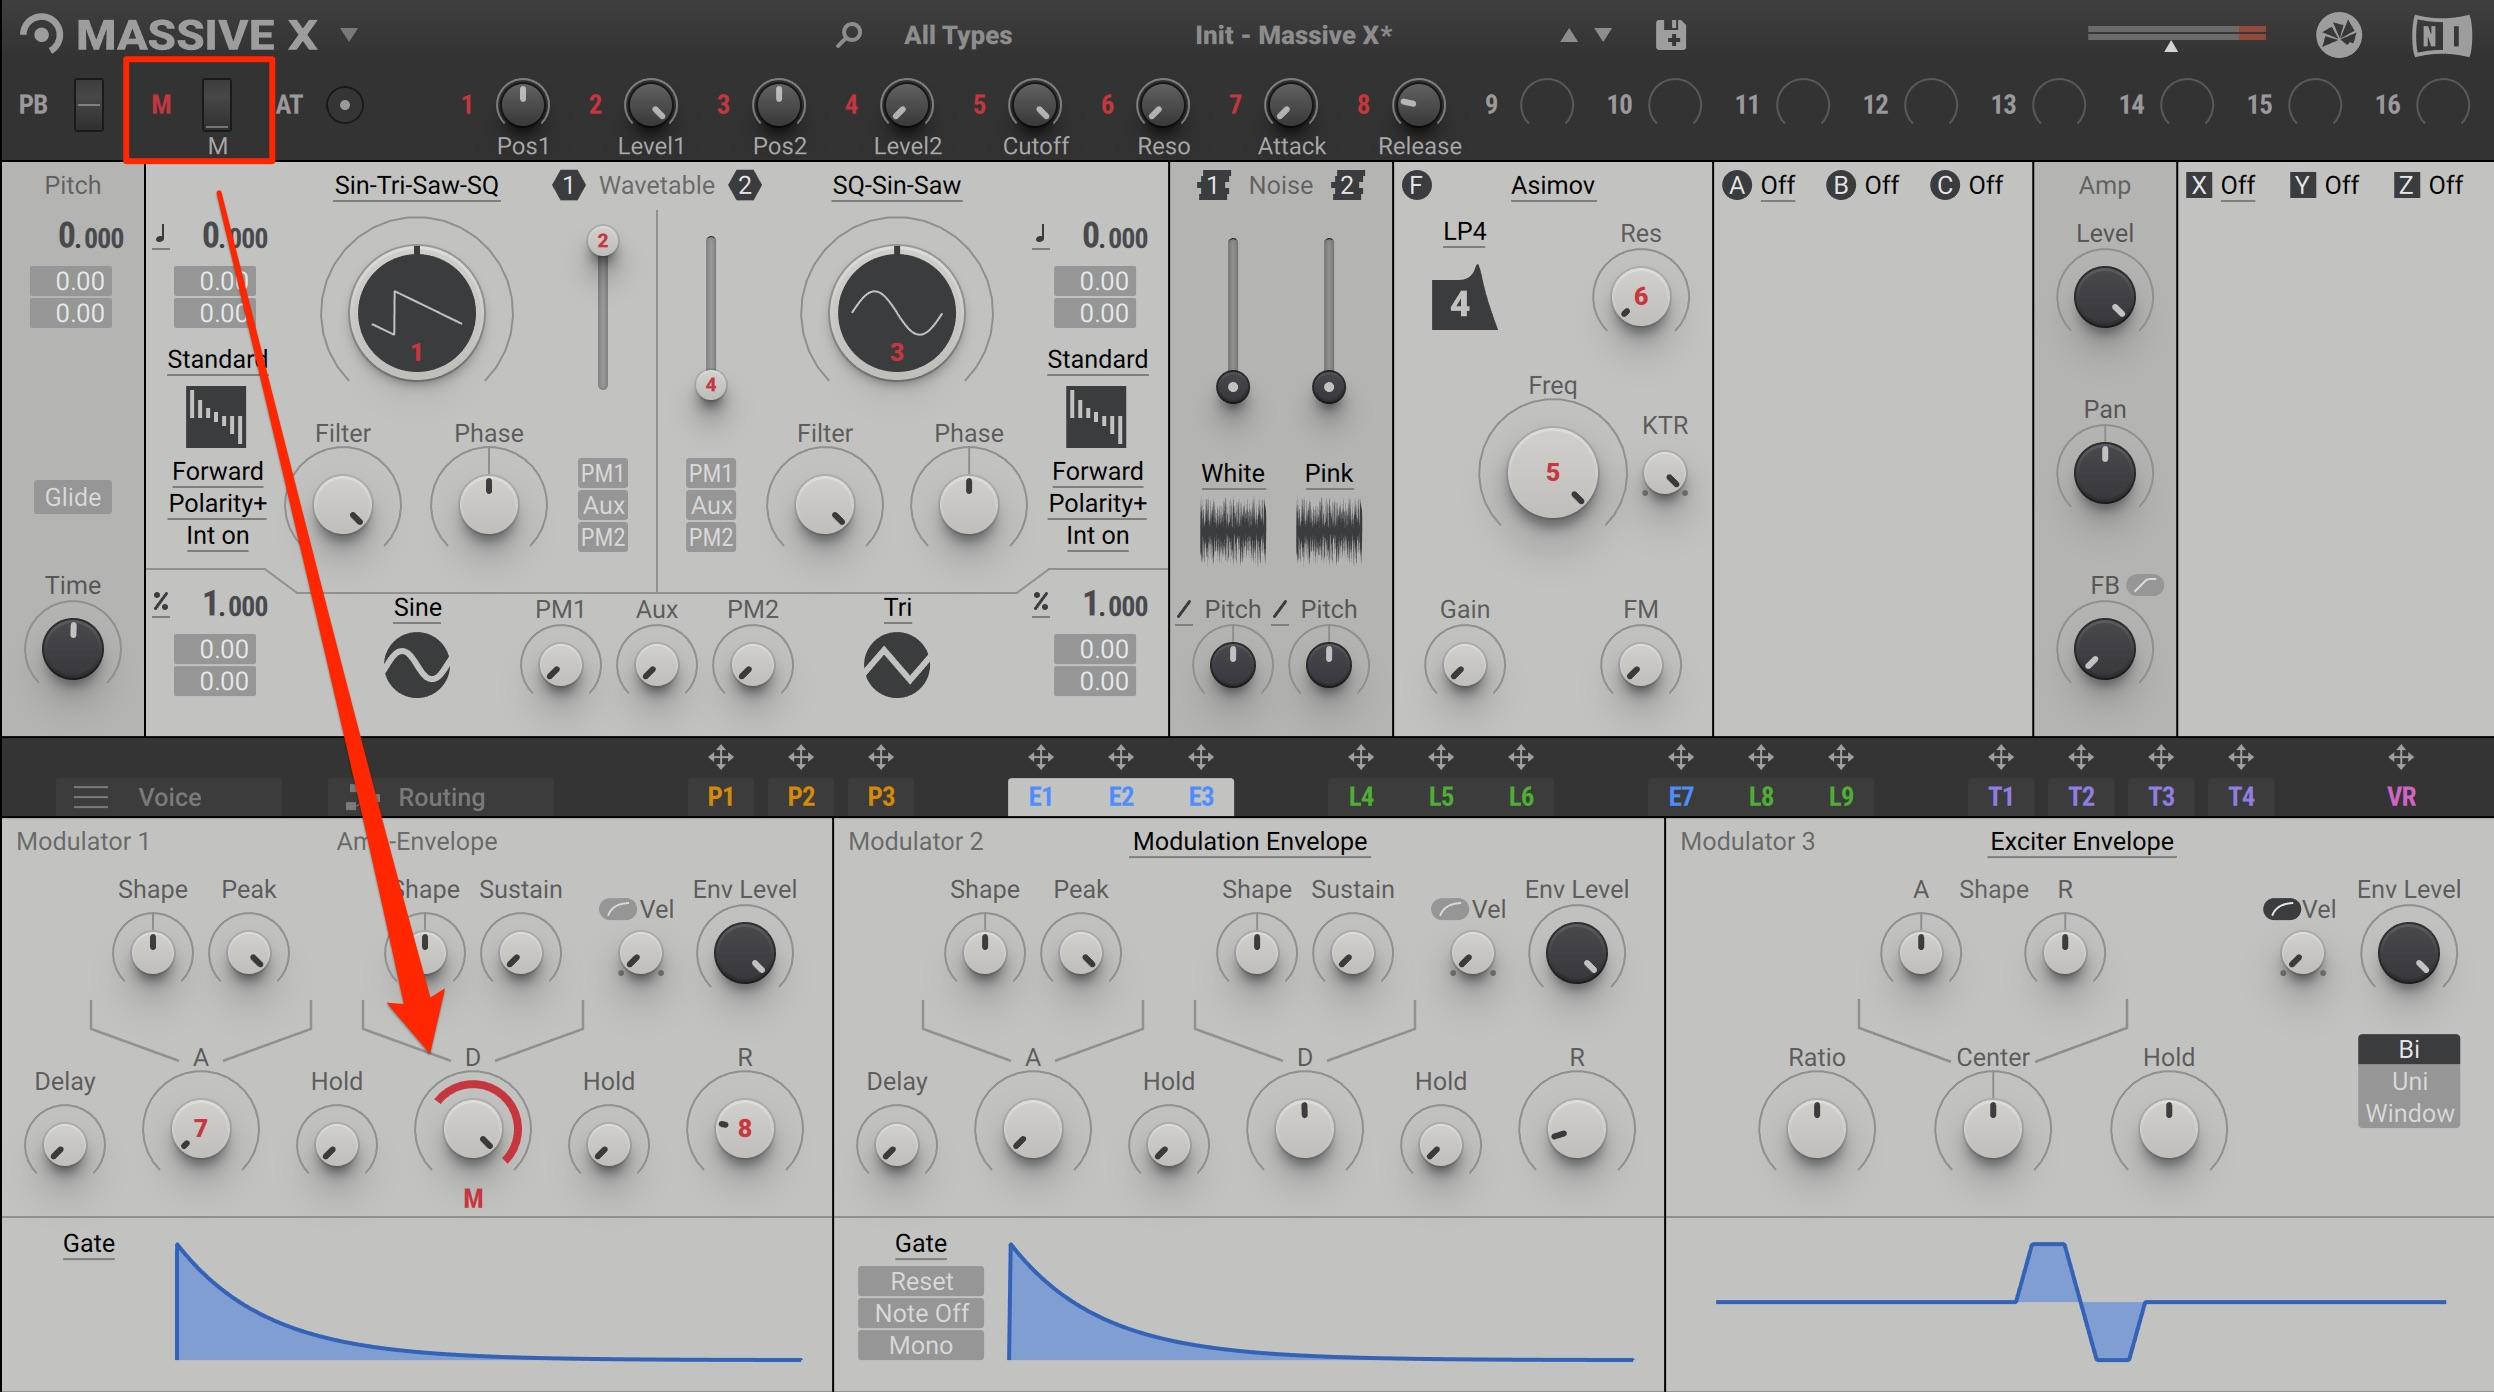 MIDI_CC_MOD